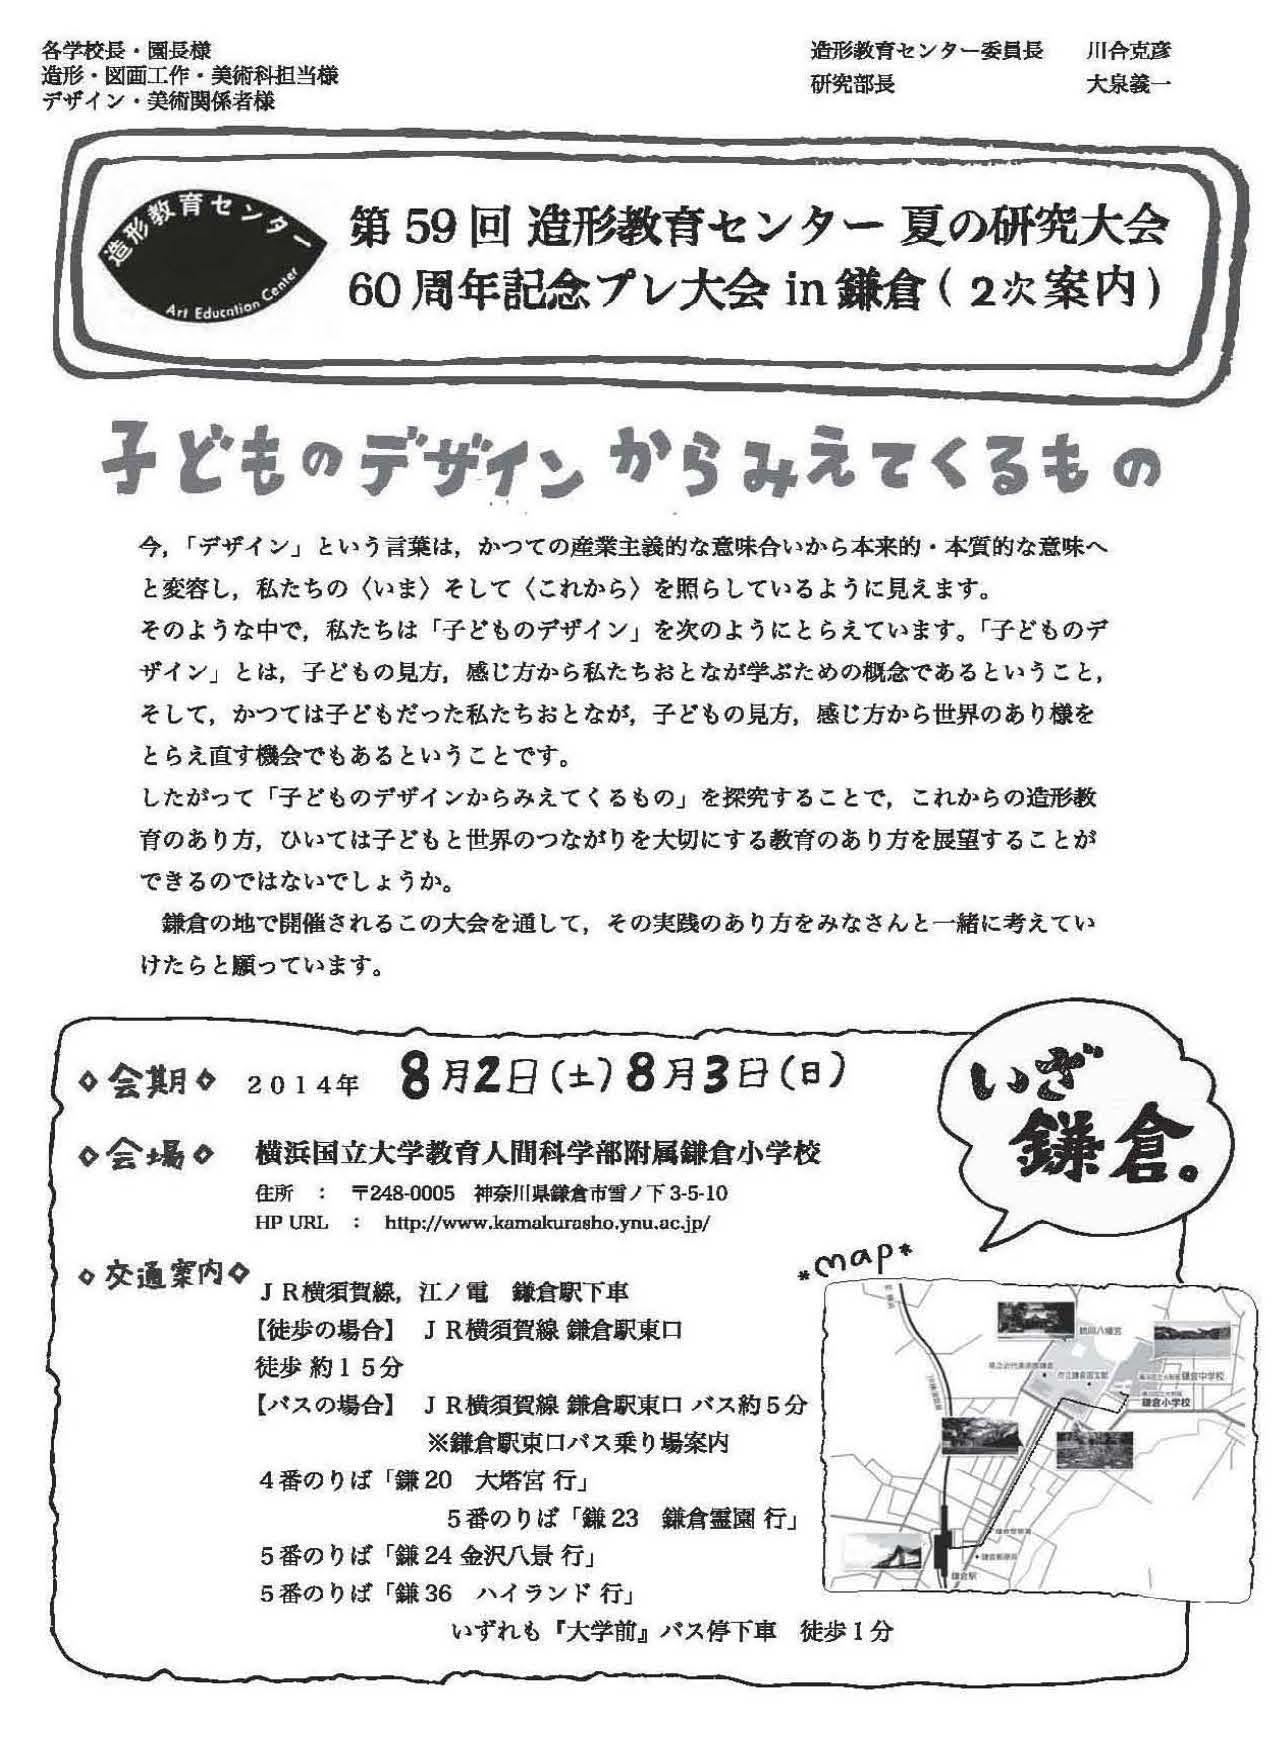 造形教育センター夏研2次案内1/2 2